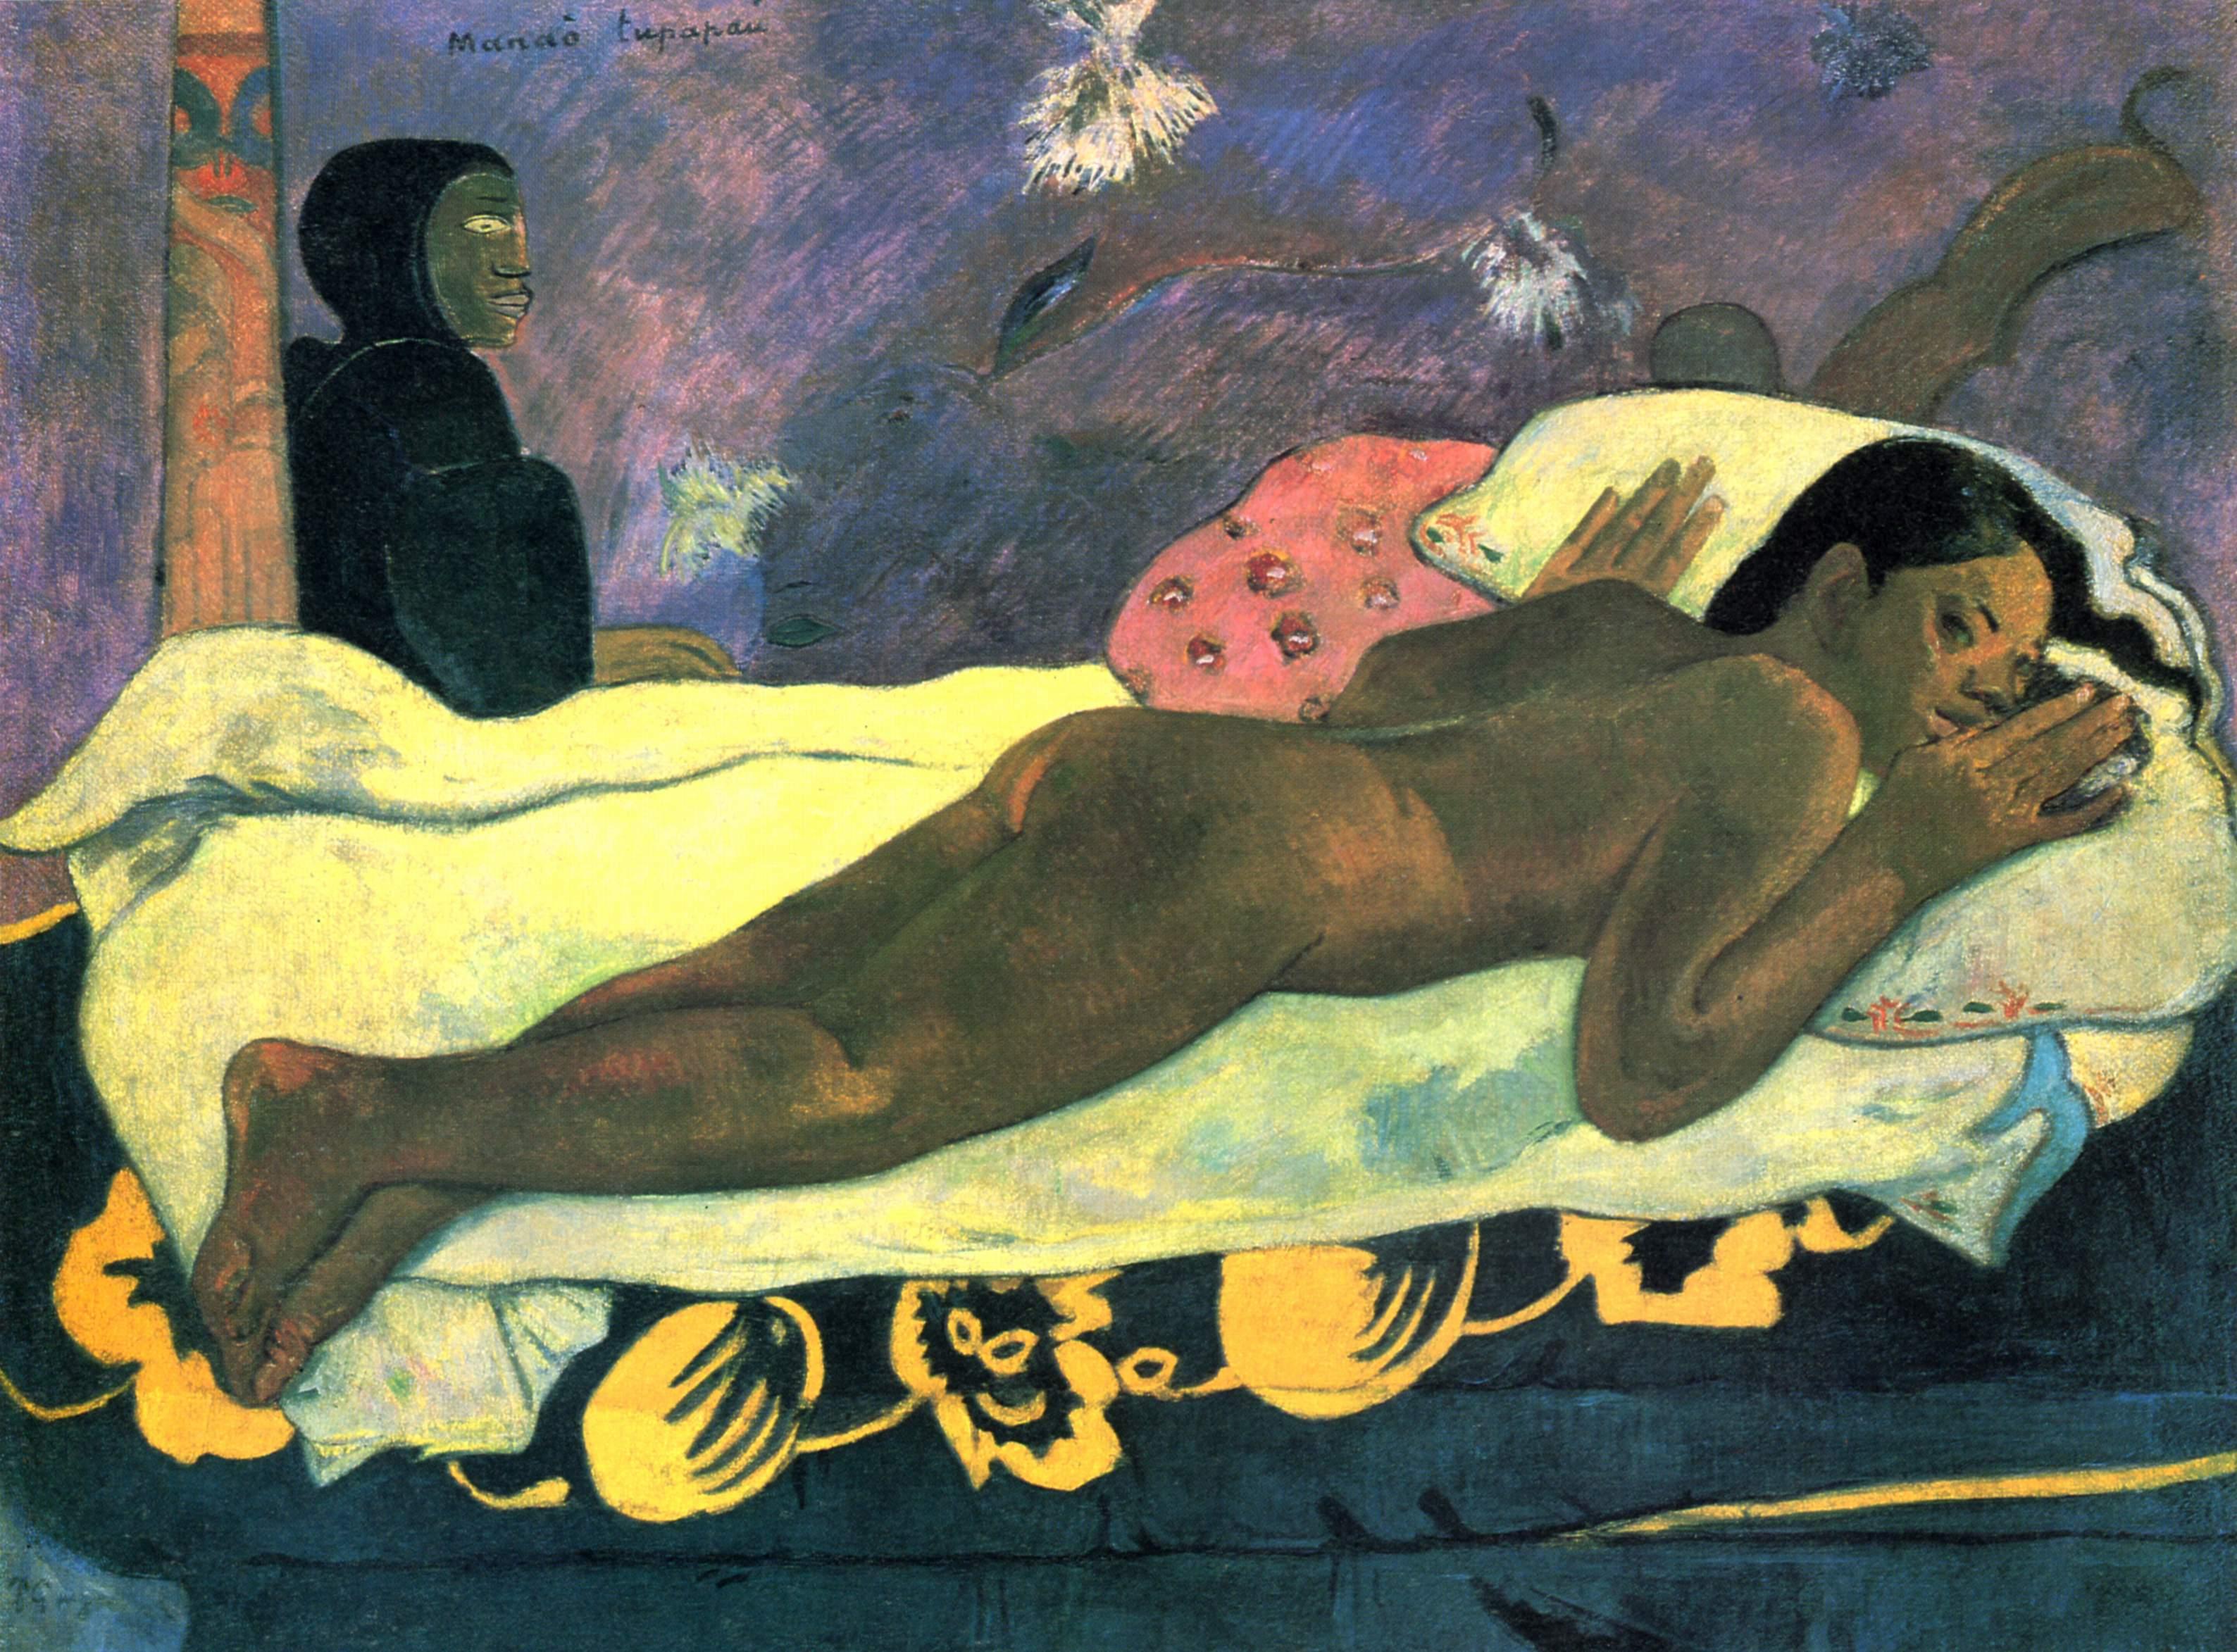 http://upload.wikimedia.org/wikipedia/commons/f/f5/Paul_Gauguin_025.jpg